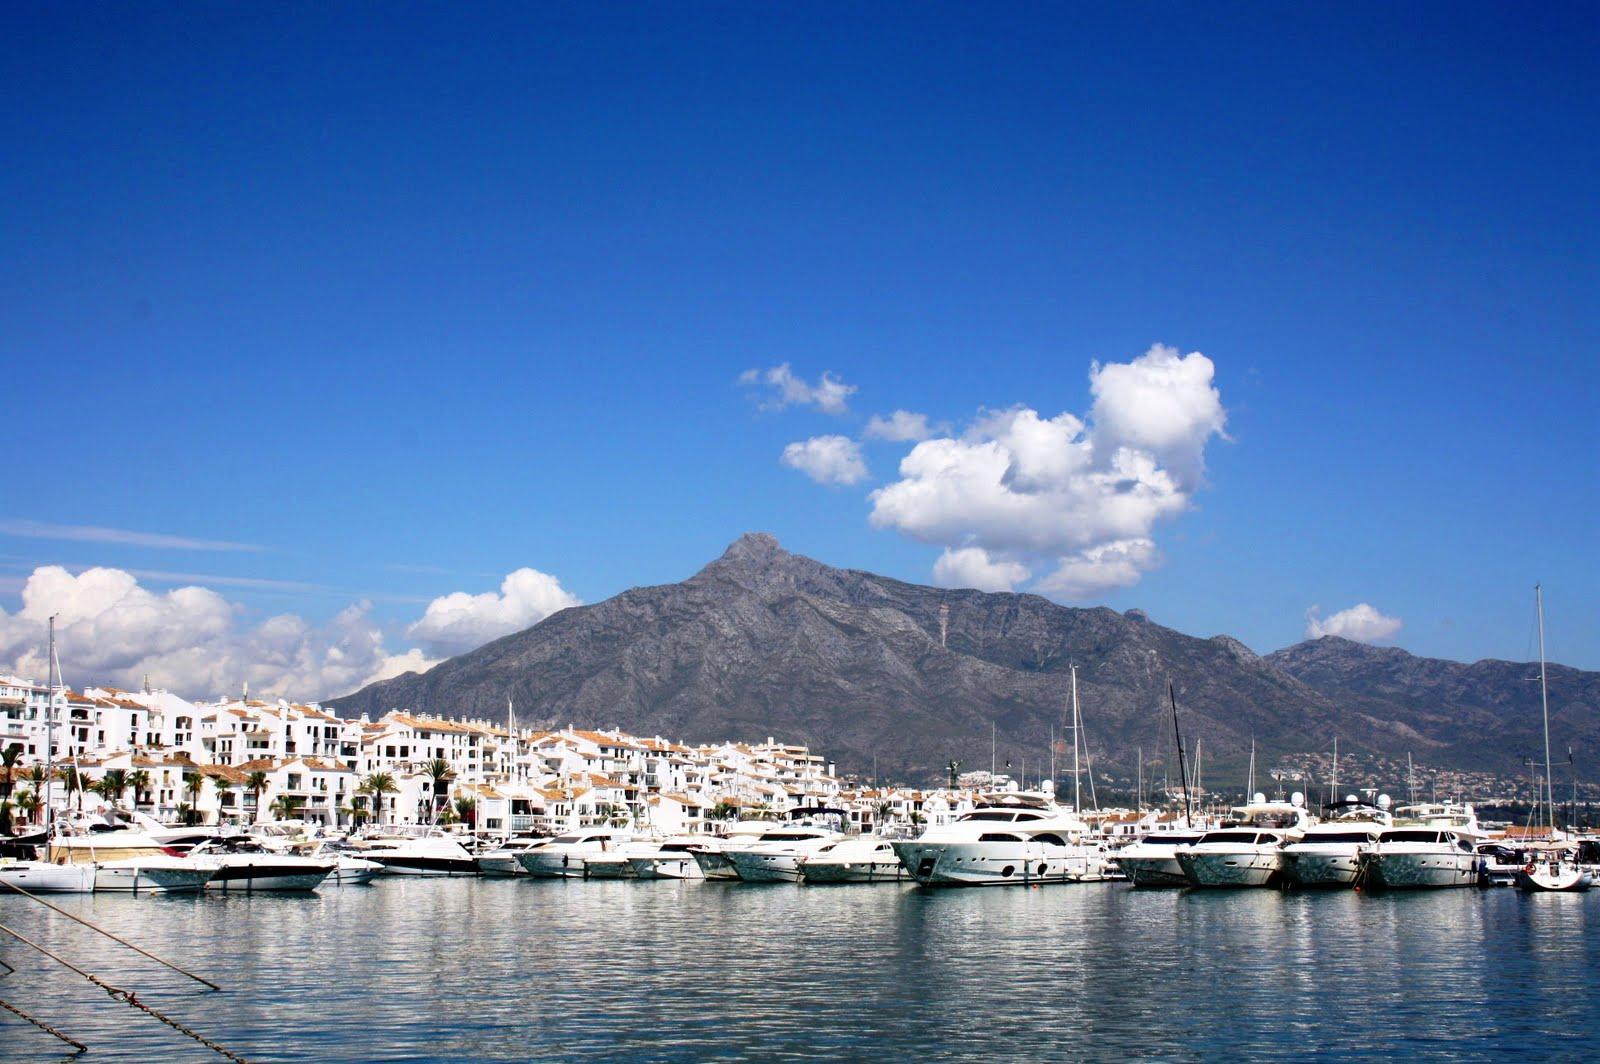 Puerto Banus Marina, Marbella